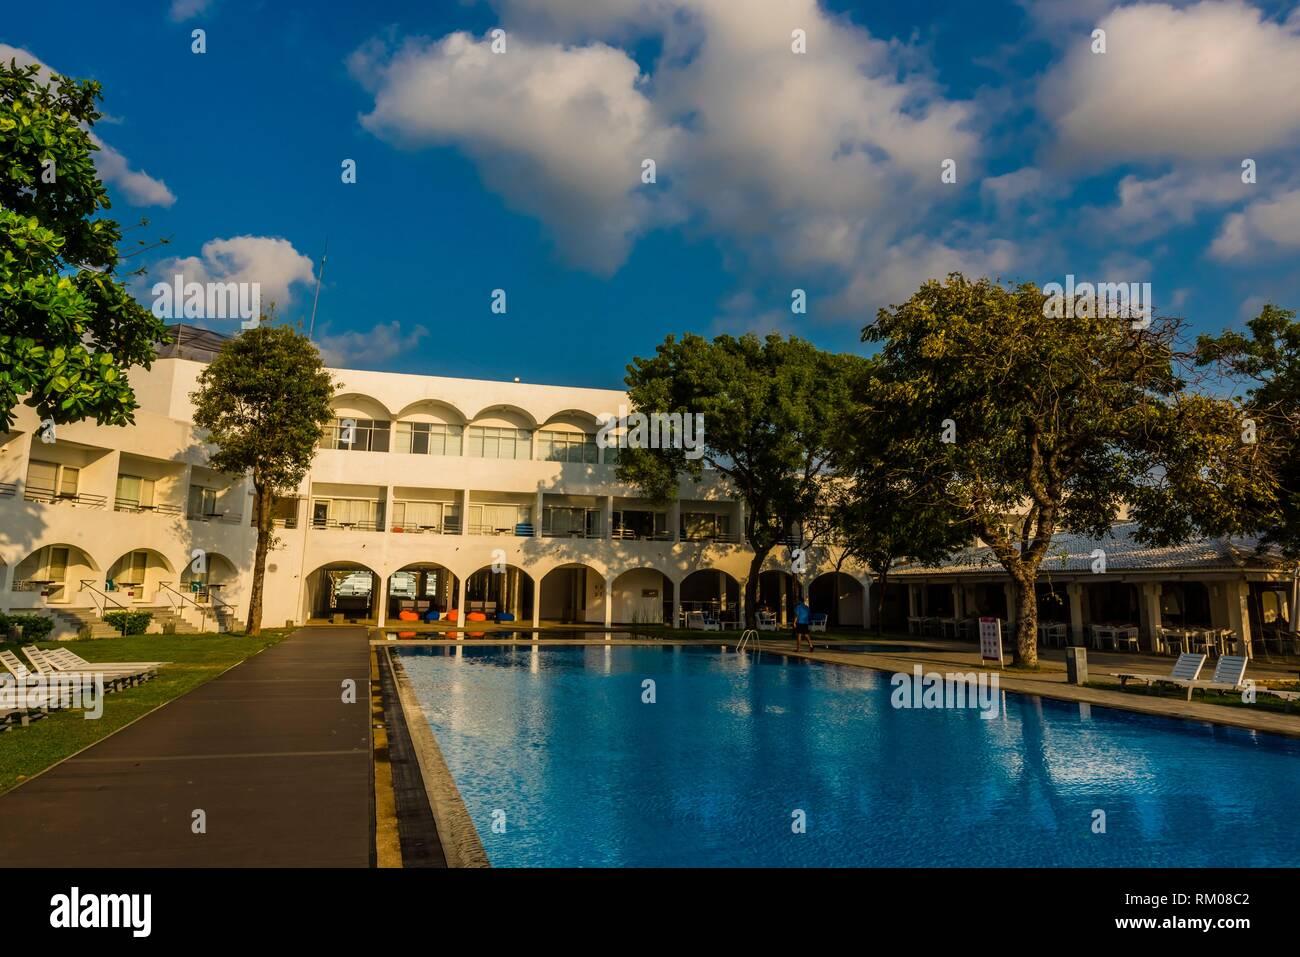 Trinco Blu by Cinnamon beach resort, Upuvali Beach, Trincomalee, Sri Lanka. - Stock Image